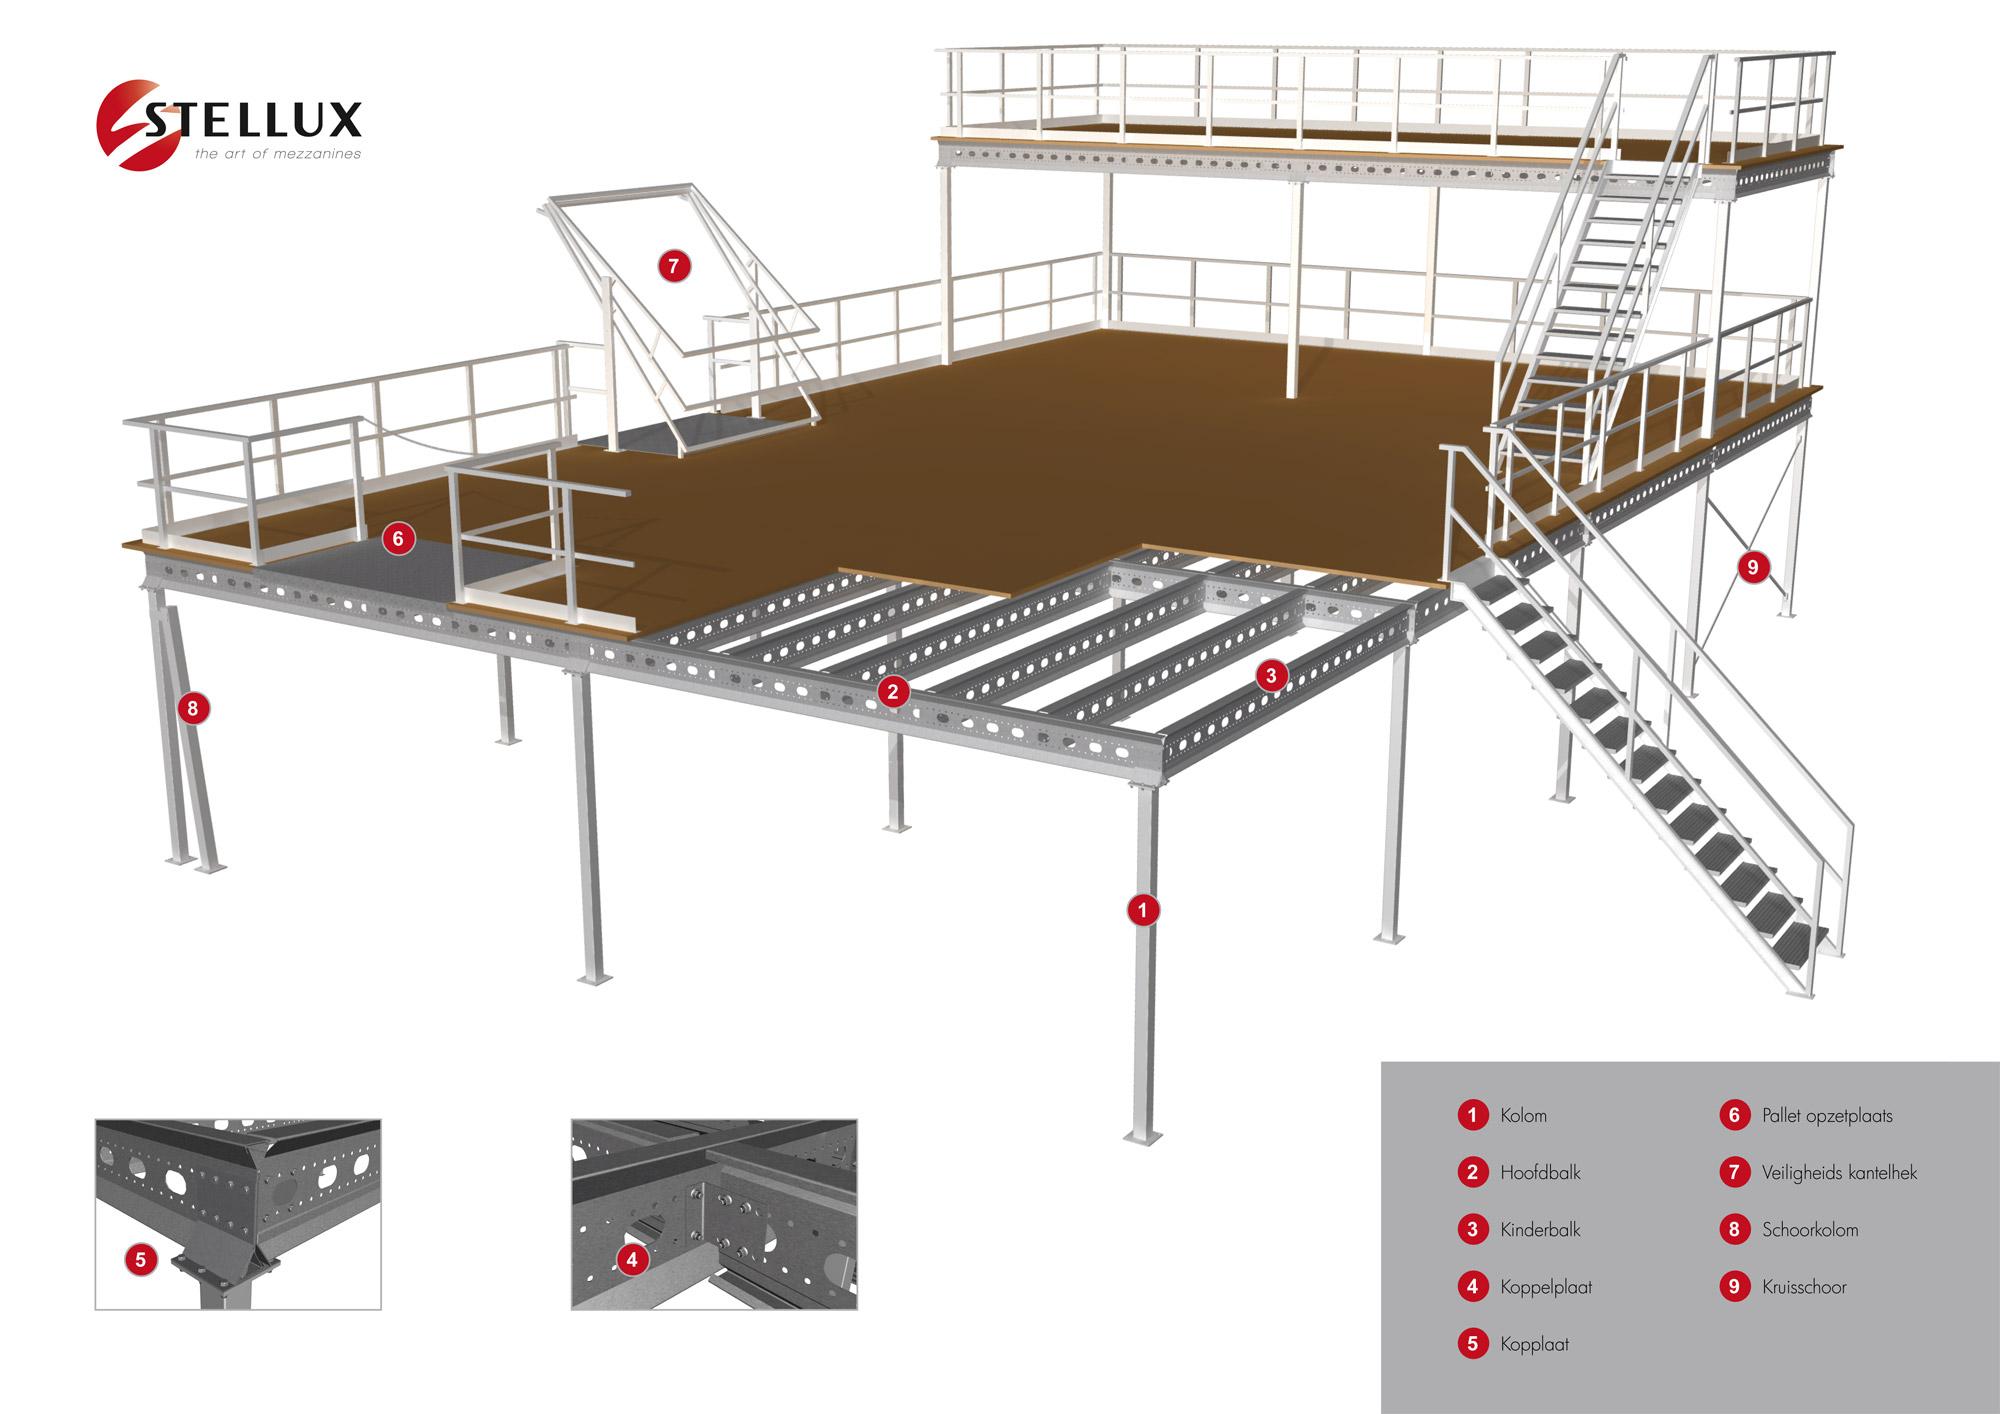 Stellux opbouw for Mezzanine floor construction details